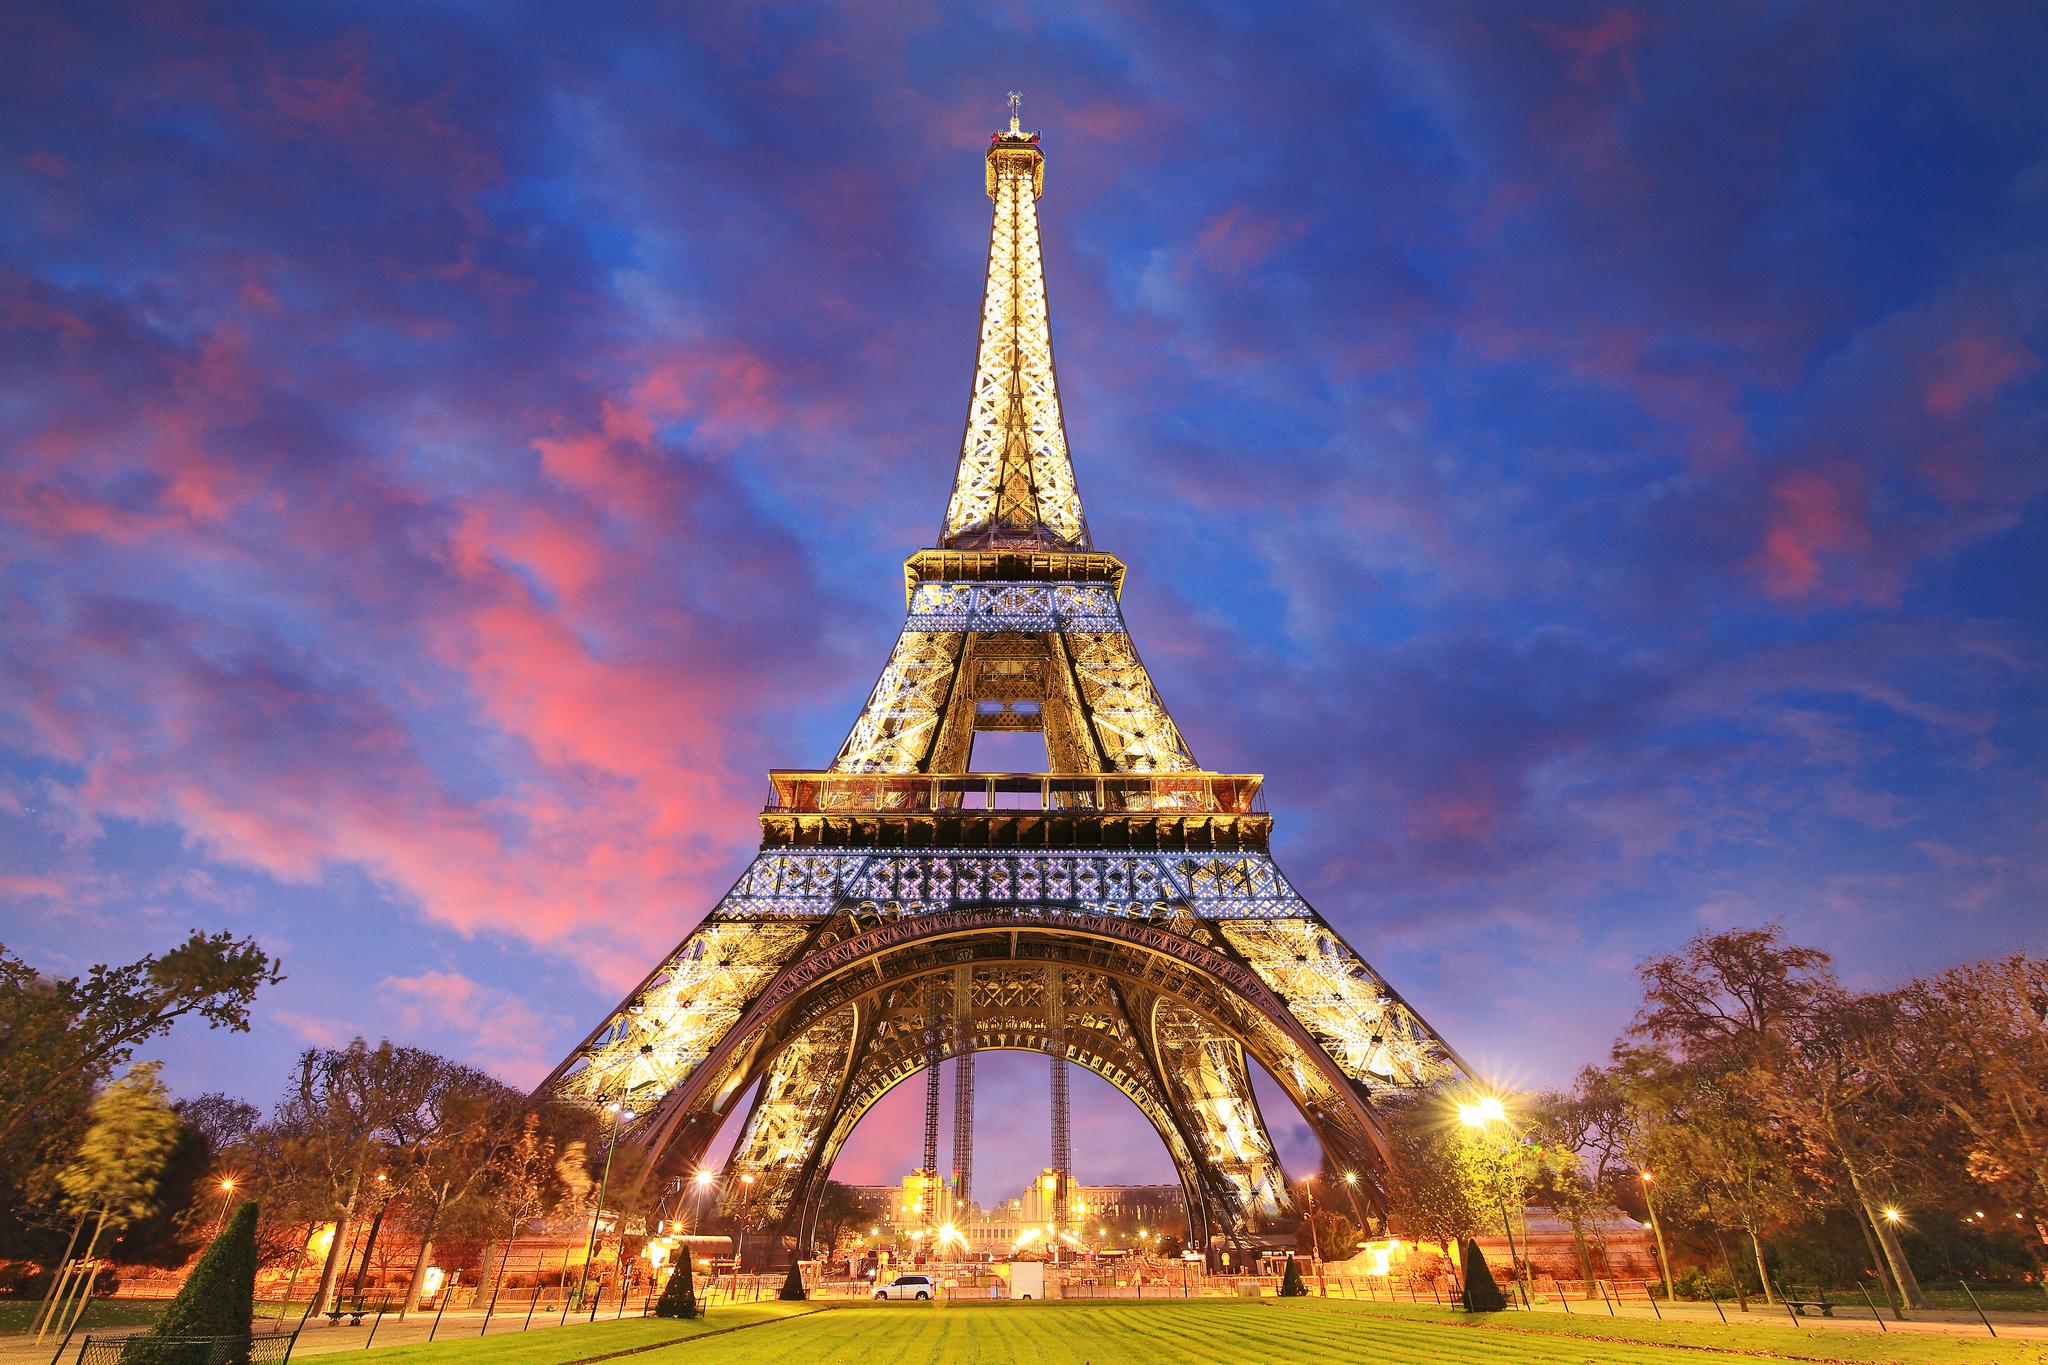 Eiffel Tower Paris Sunset Wallpaper Resolution 2048x1365 Id 960159 Wallha Com